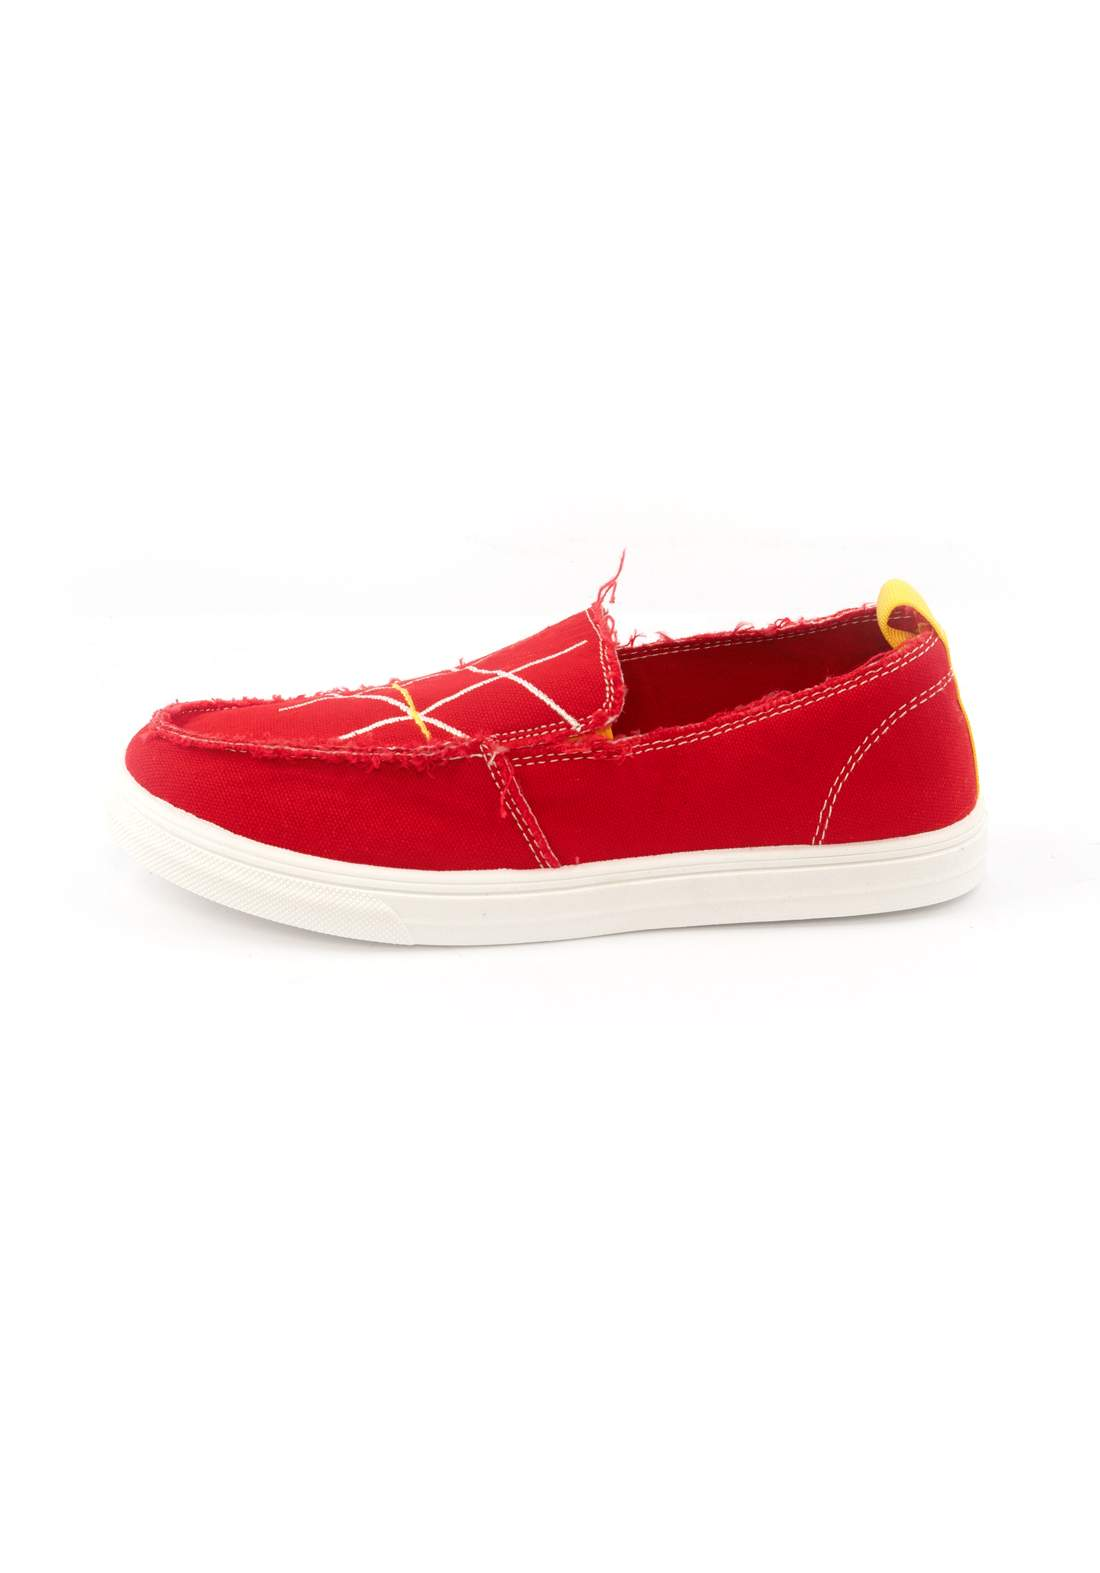 حذاء نسائي قماش أحمر اللون